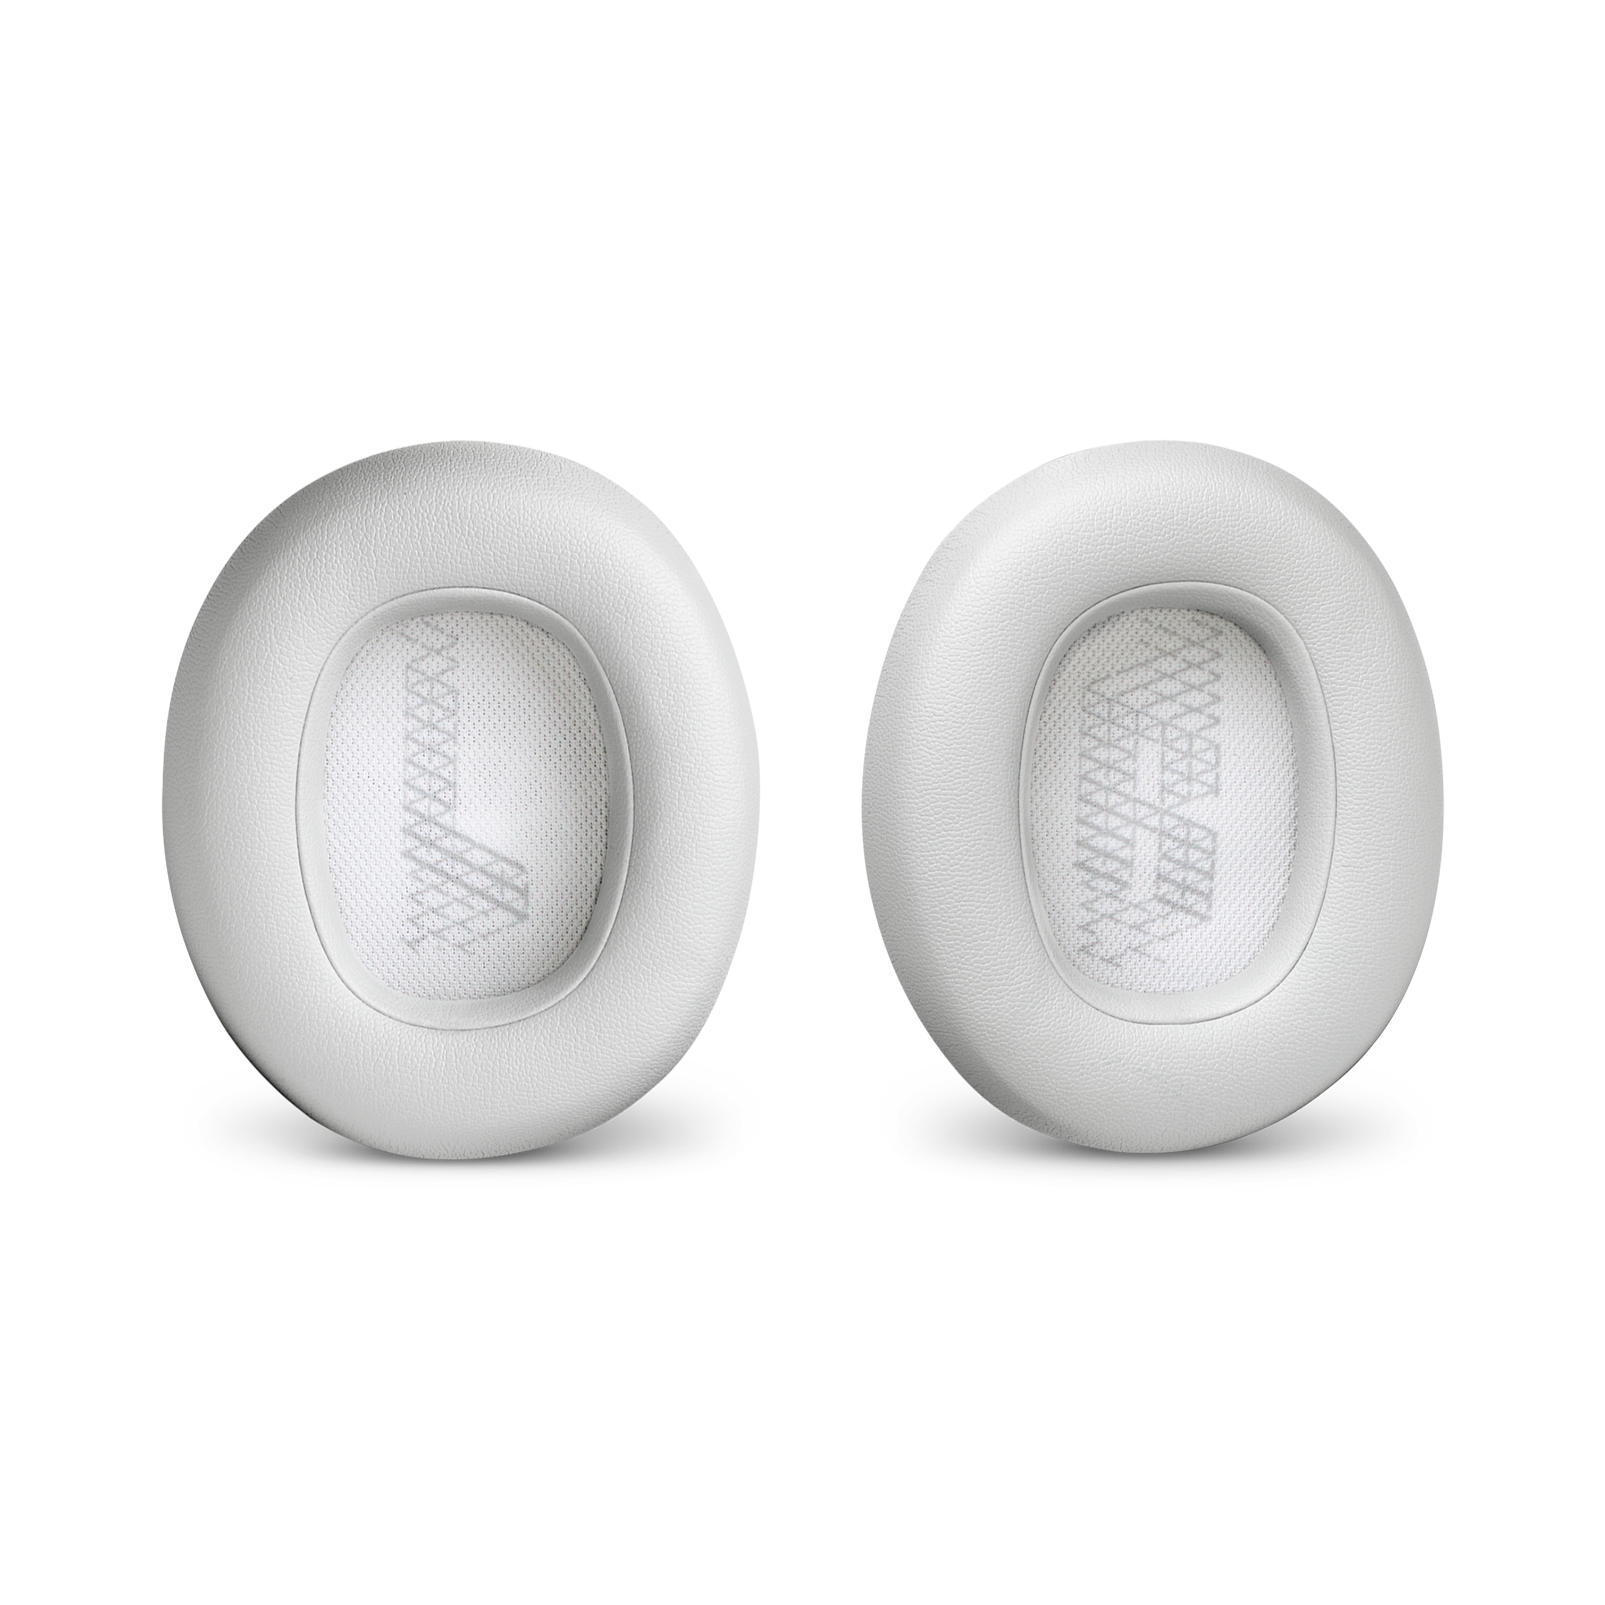 JBL Ear pads for Live 650